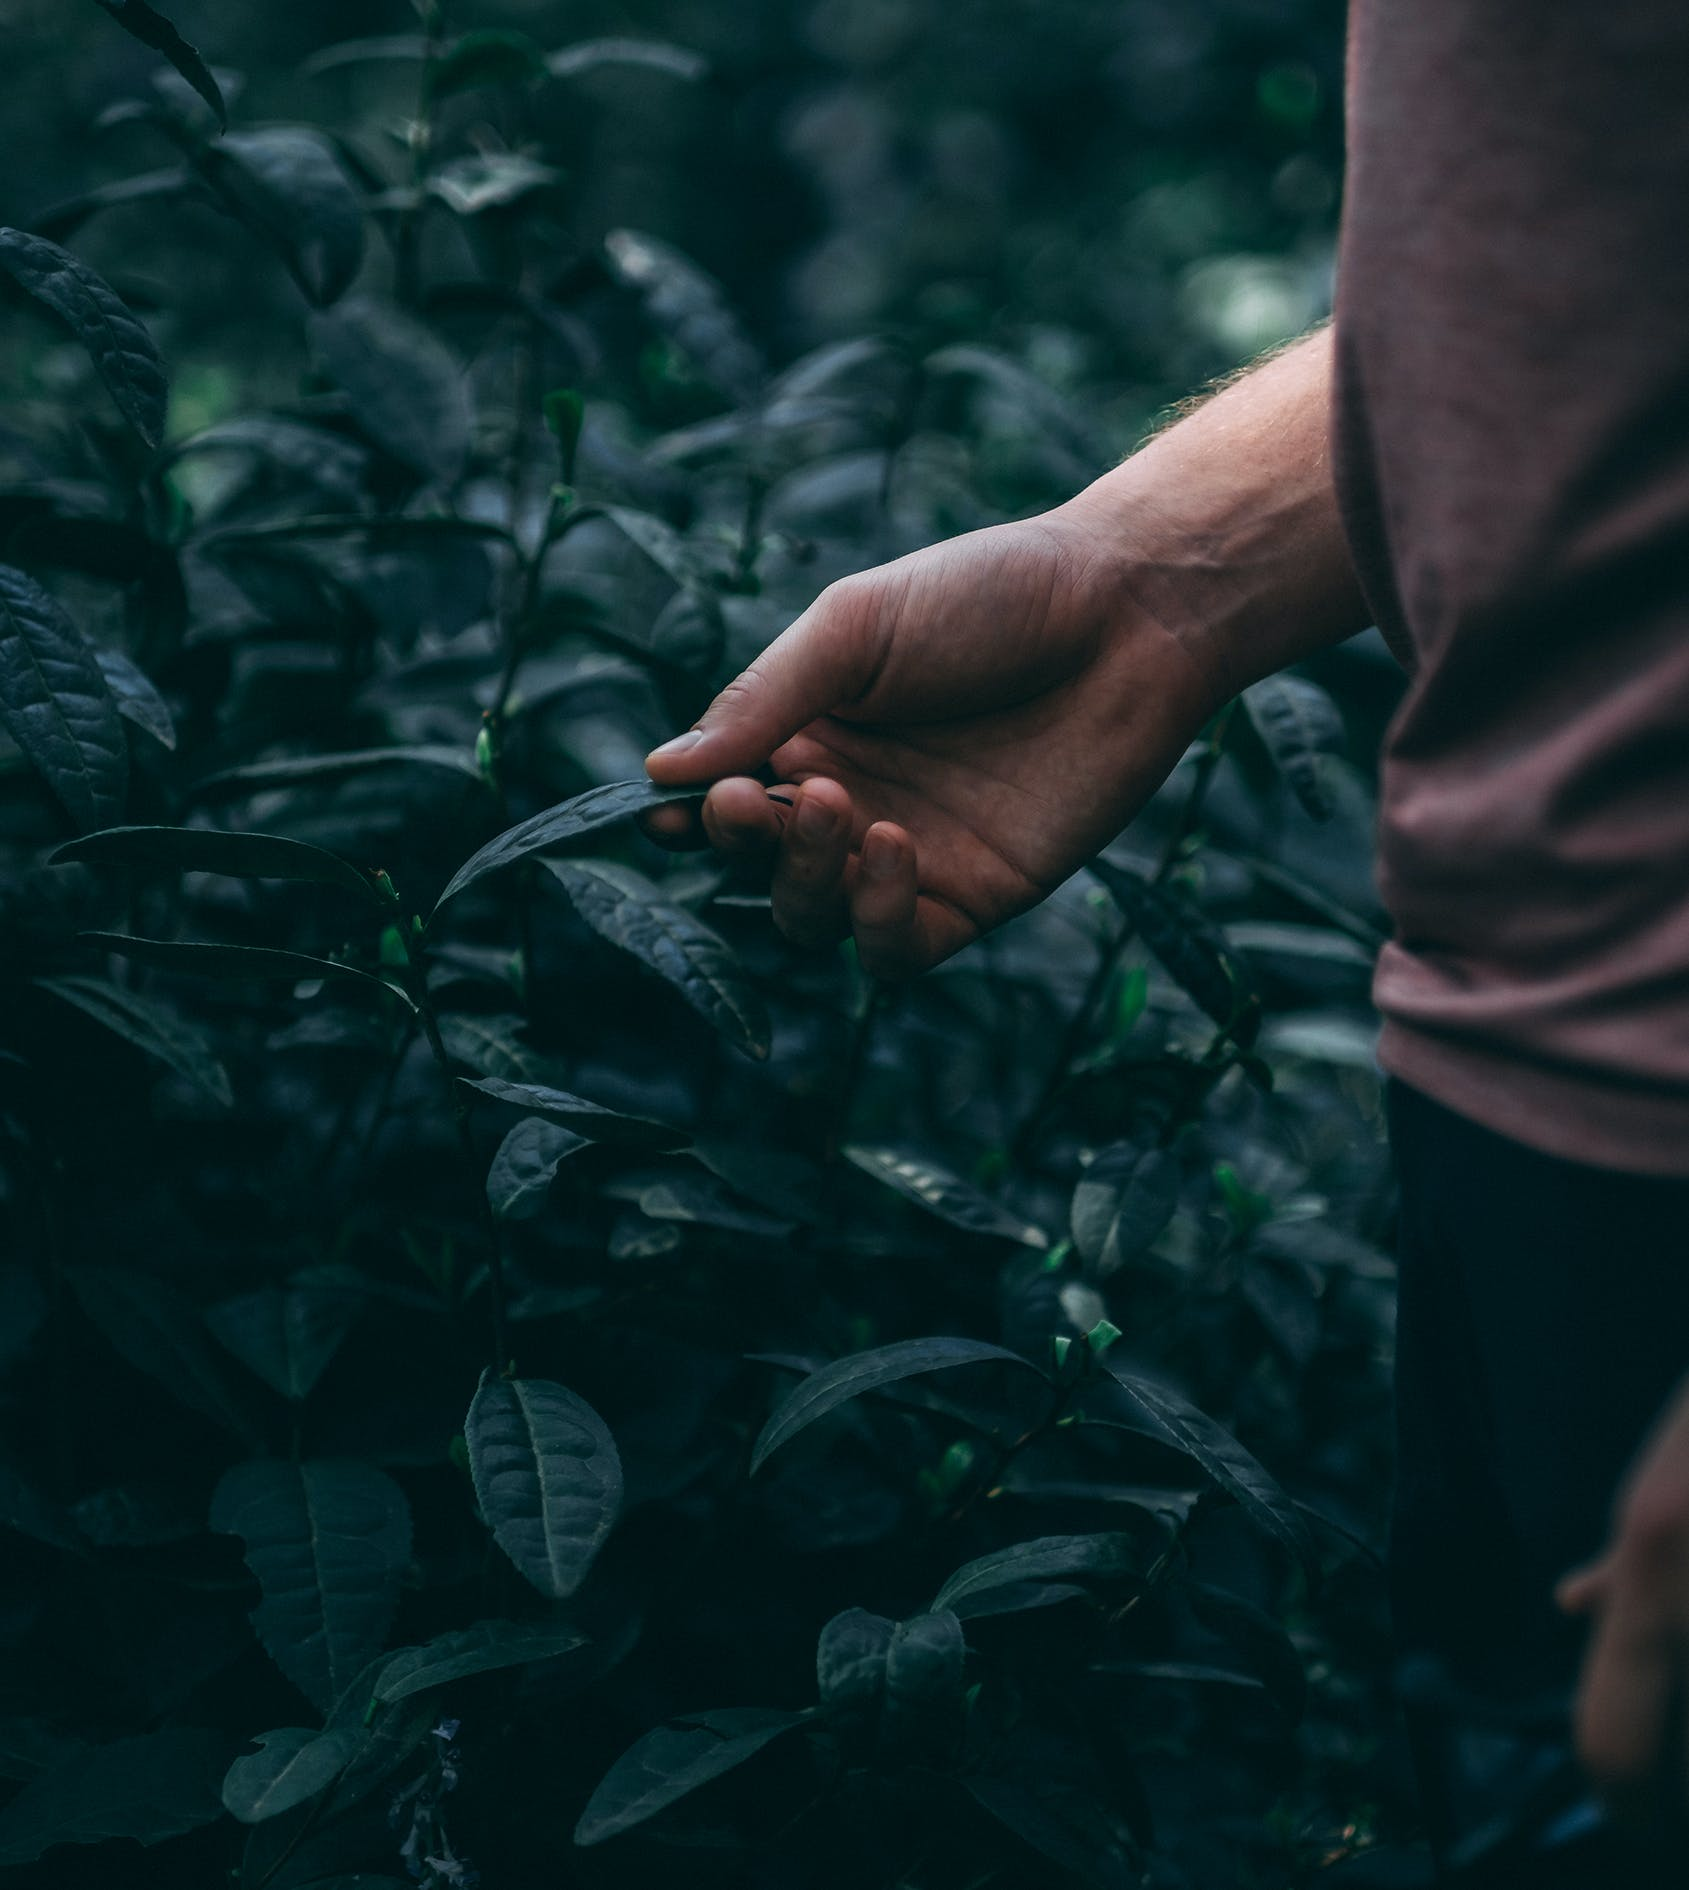 Tea leaf in hand